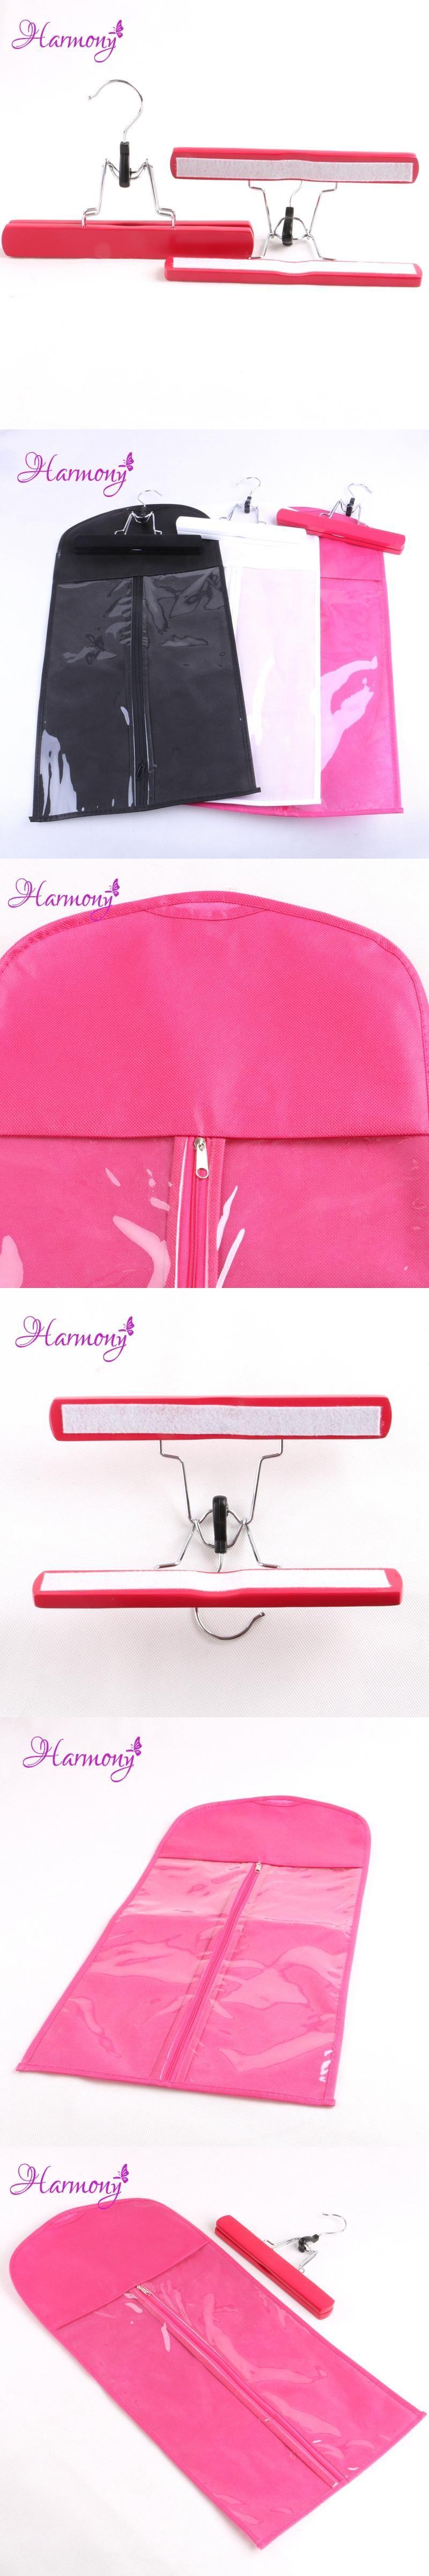 2sets Pink Color Hair Extensions Storage Bag Carrier Suit Case Bag